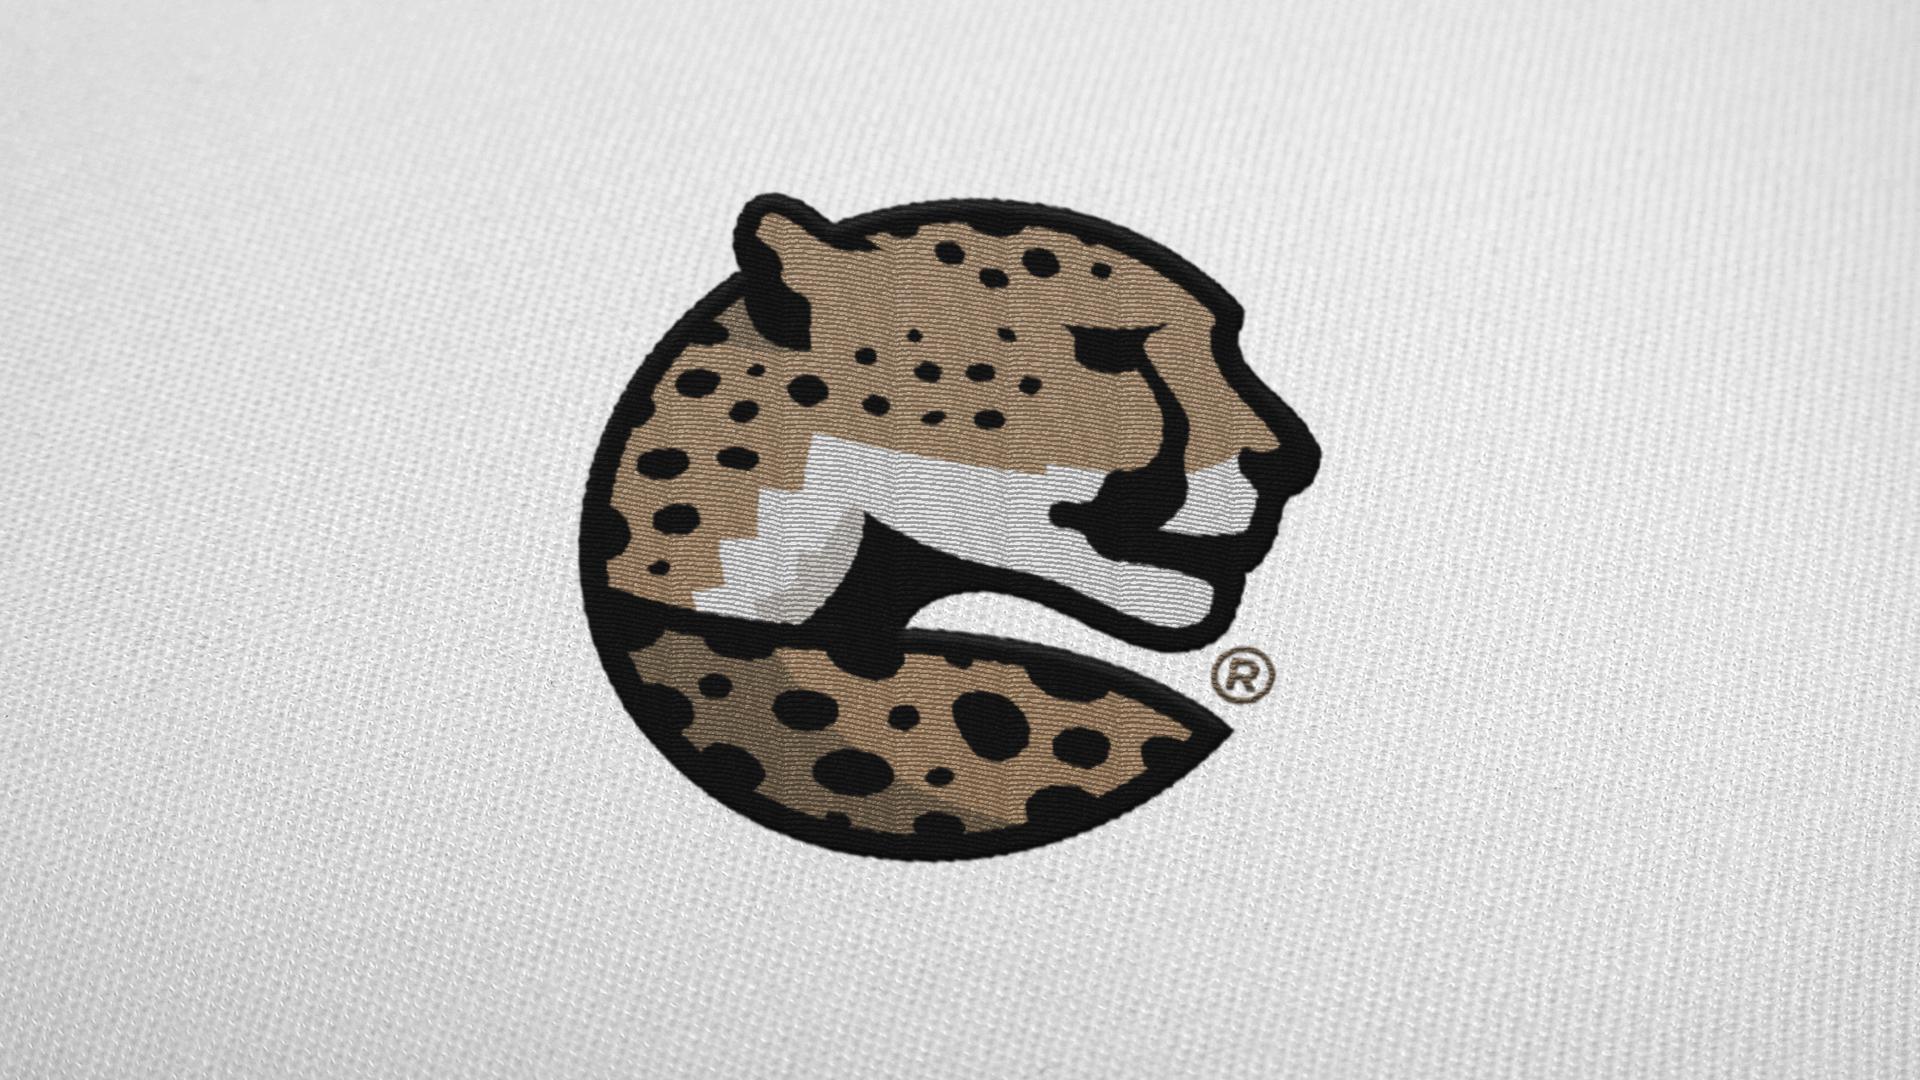 Sports Brand Design cheetah logo for MOMFIT Sportswear